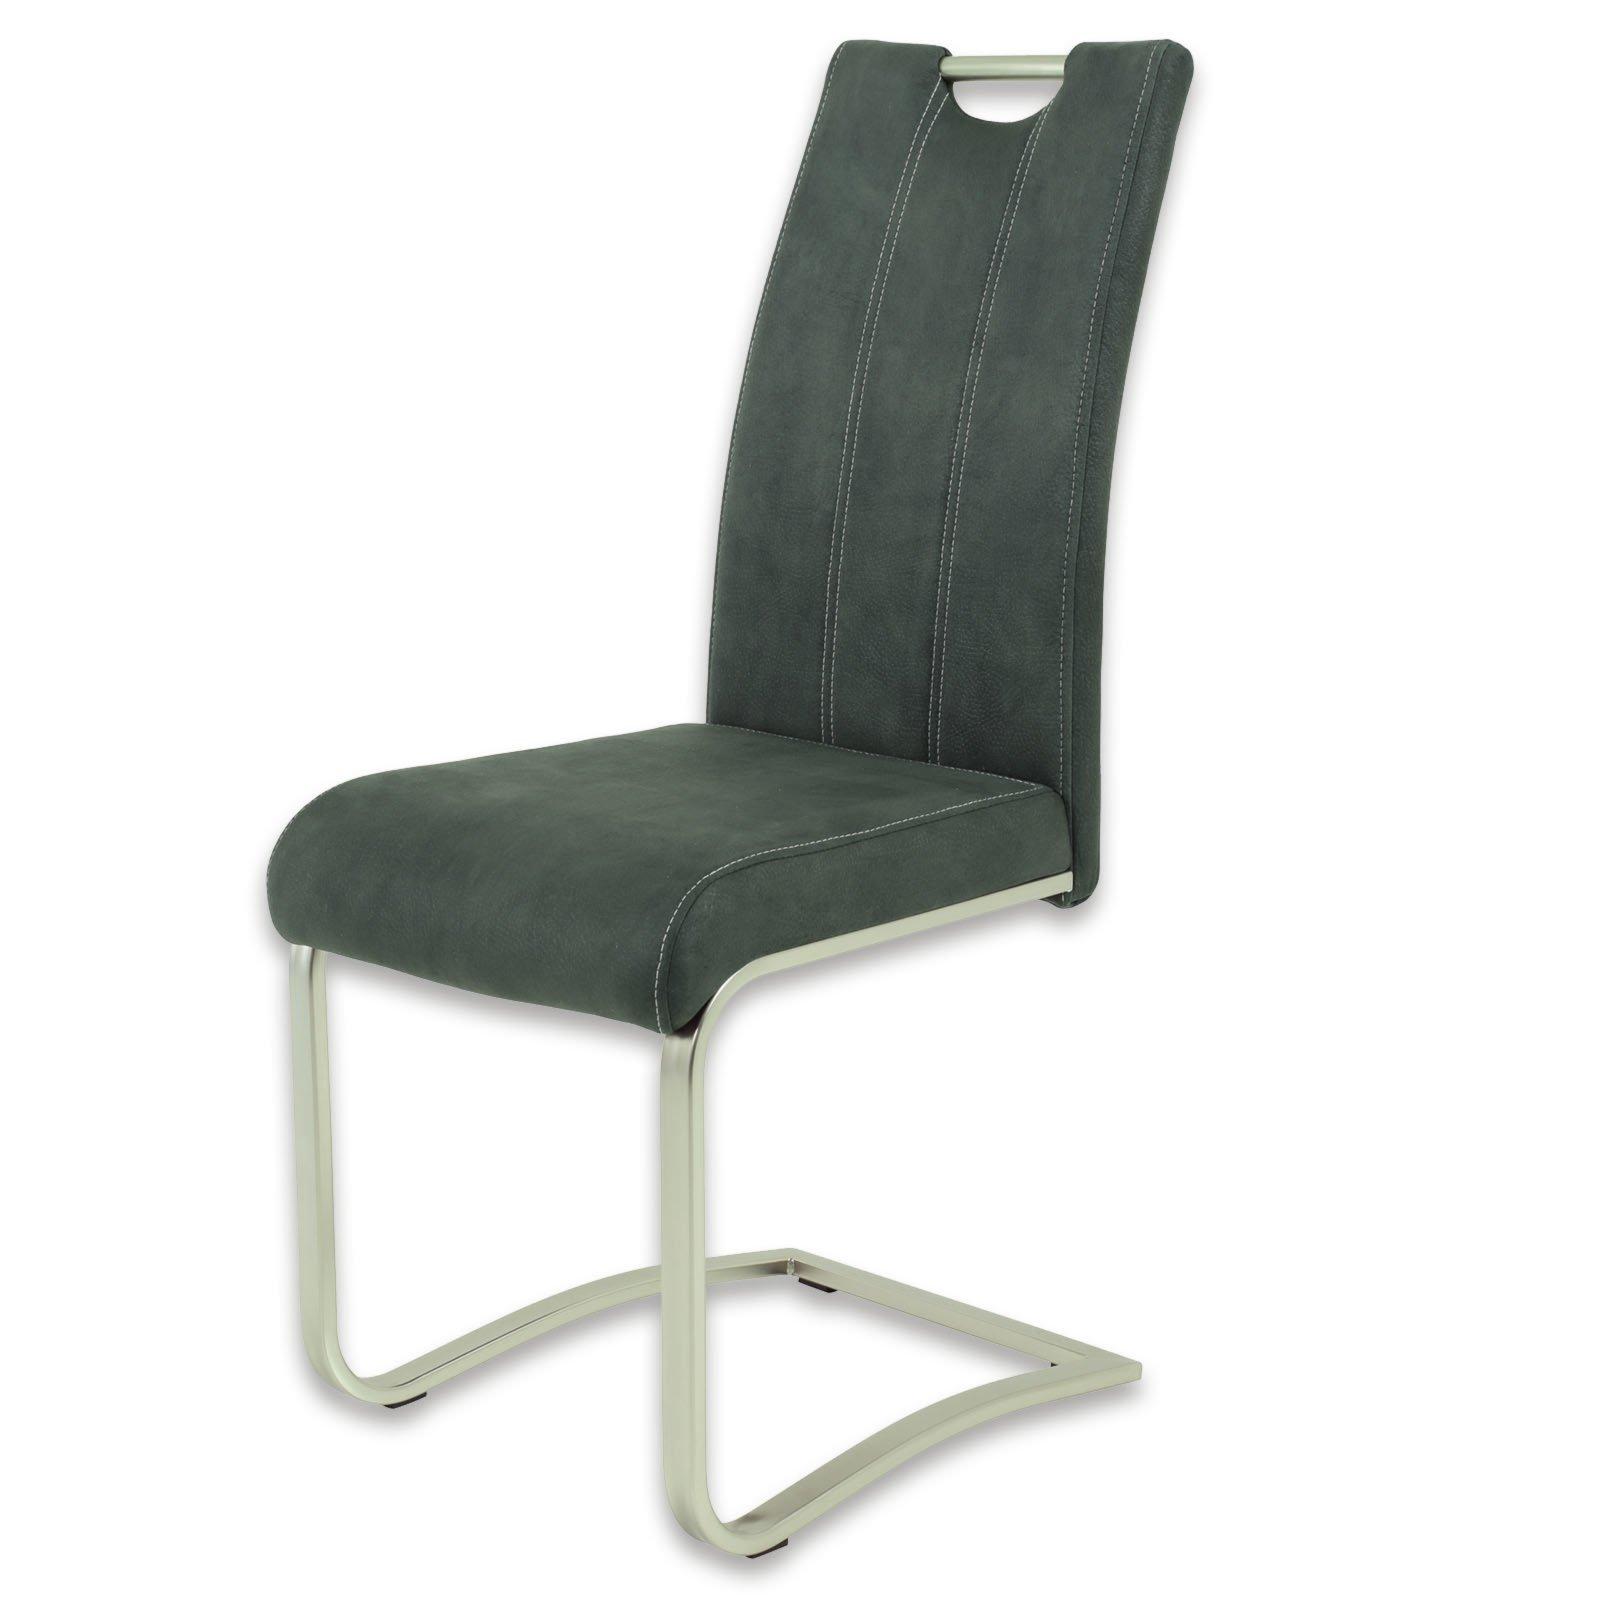 was ist microfaser best tencel x grau with was ist. Black Bedroom Furniture Sets. Home Design Ideas